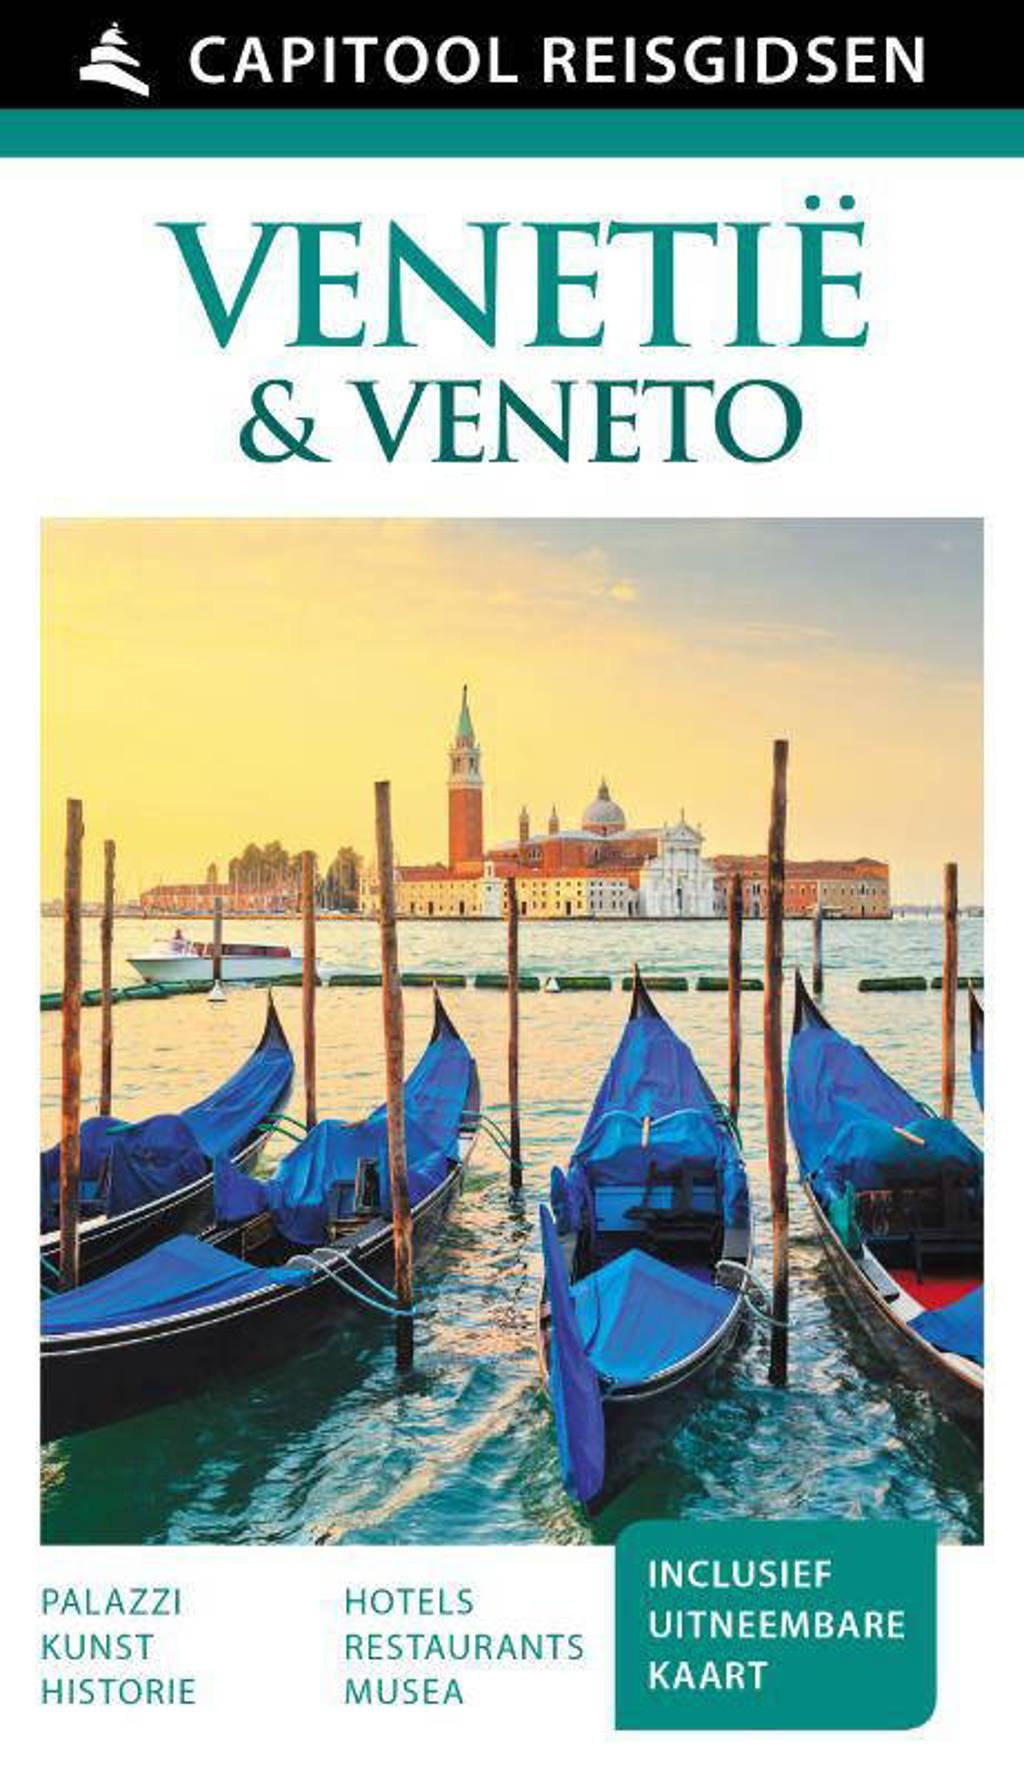 Capitool reisgidsen: Venetië - Susie Boulton en Christopher Catling